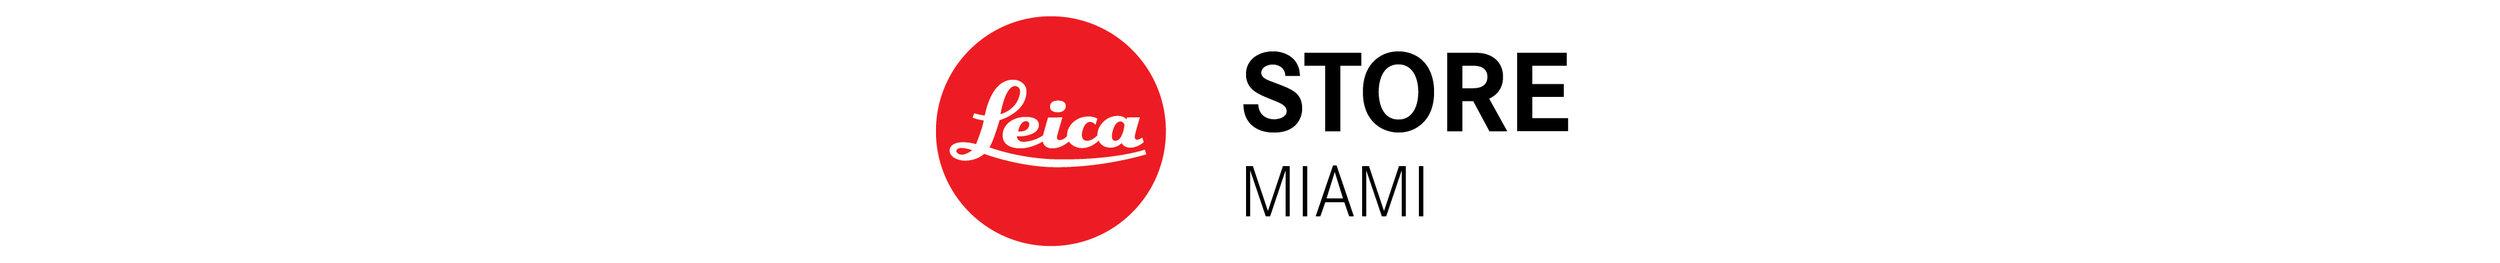 Leica_Store_Miami long.jpg